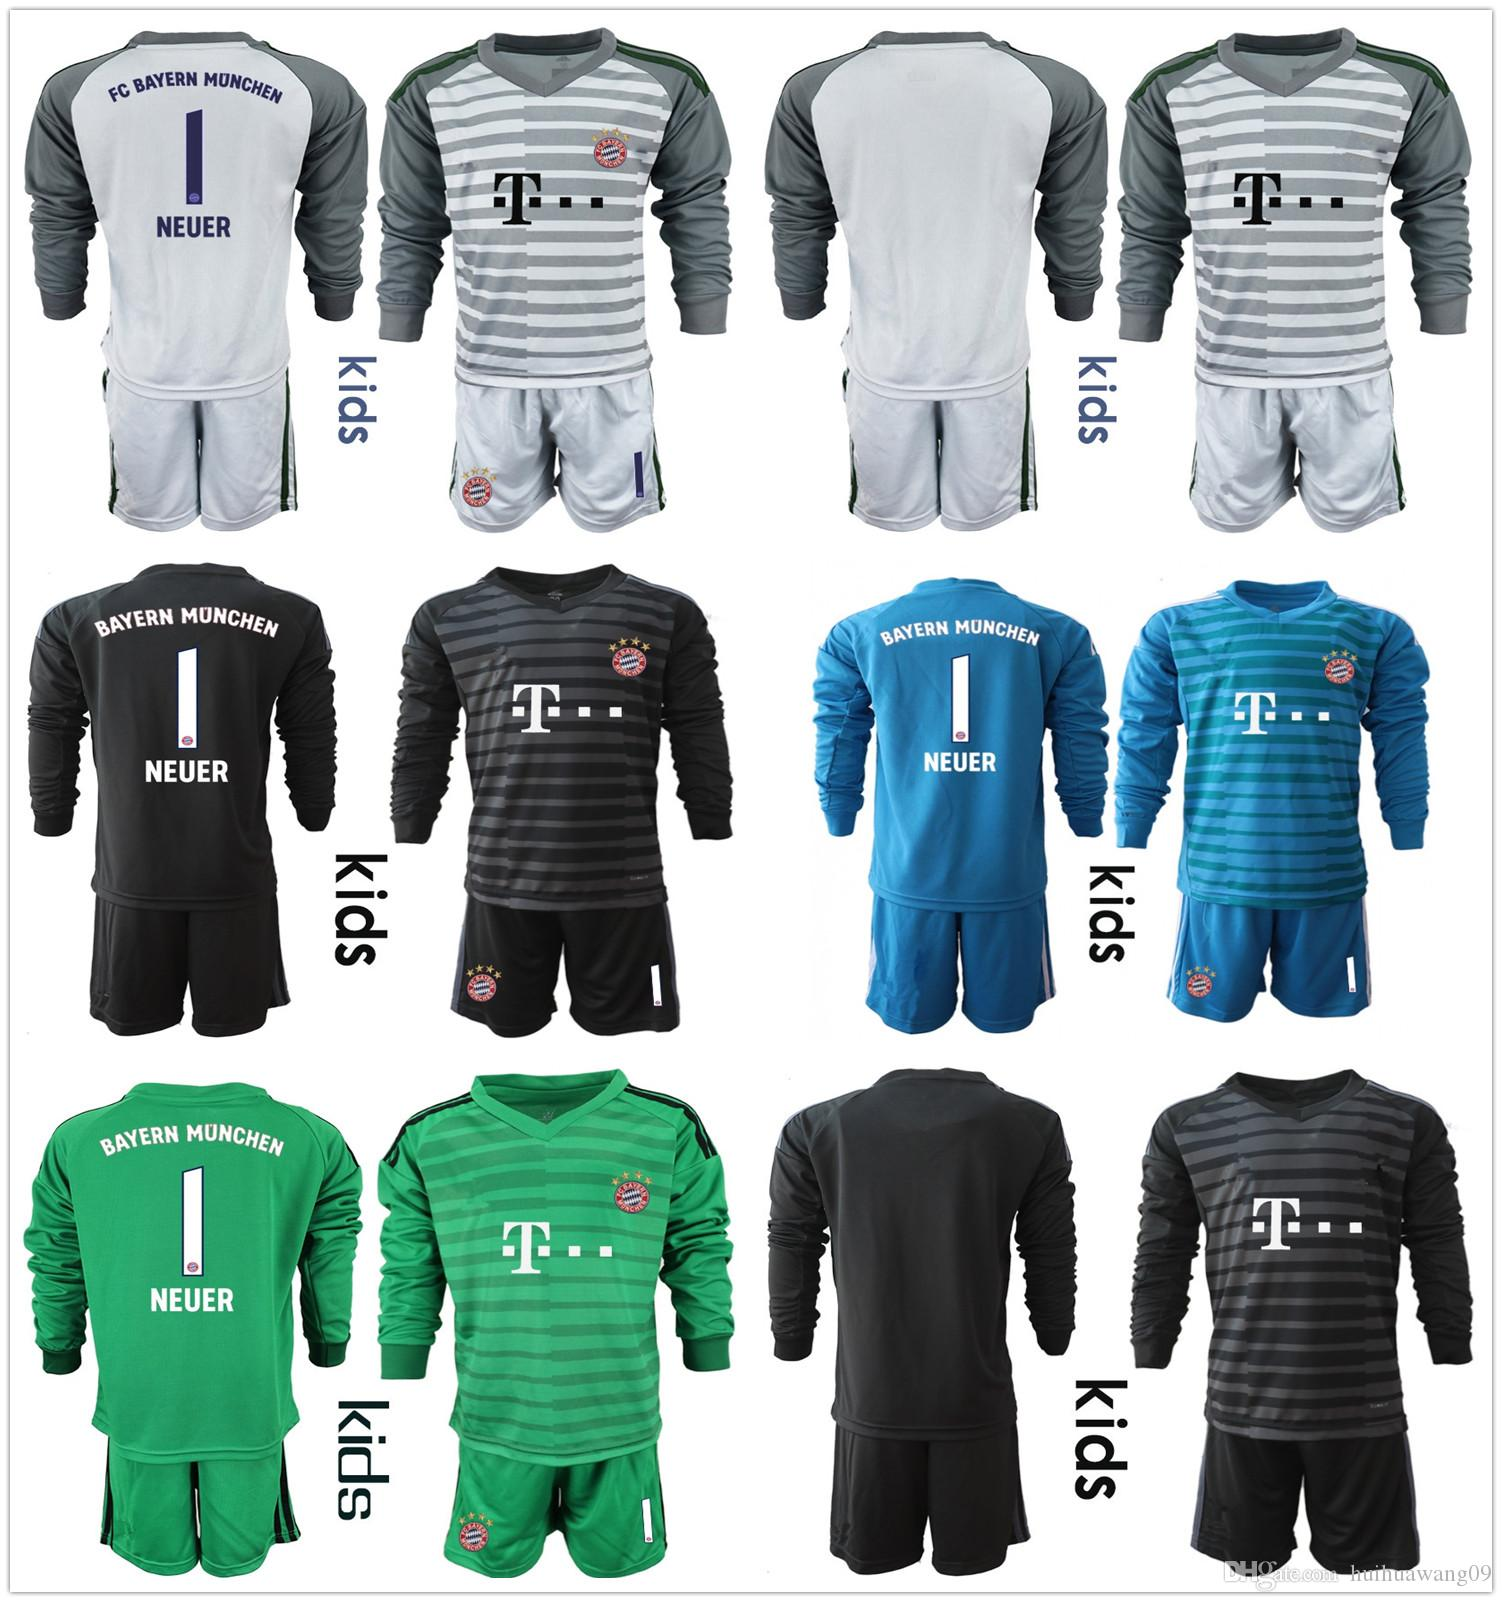 6362e775ac Compre 2018 2019 Niños Camiseta De Mangas Largas NEUER Portero Kit  Conjuntos De Fútbol Juvenil   1 Manuel Neuer   26 Ulreich Hoffmann Kits De  Fútbol ...